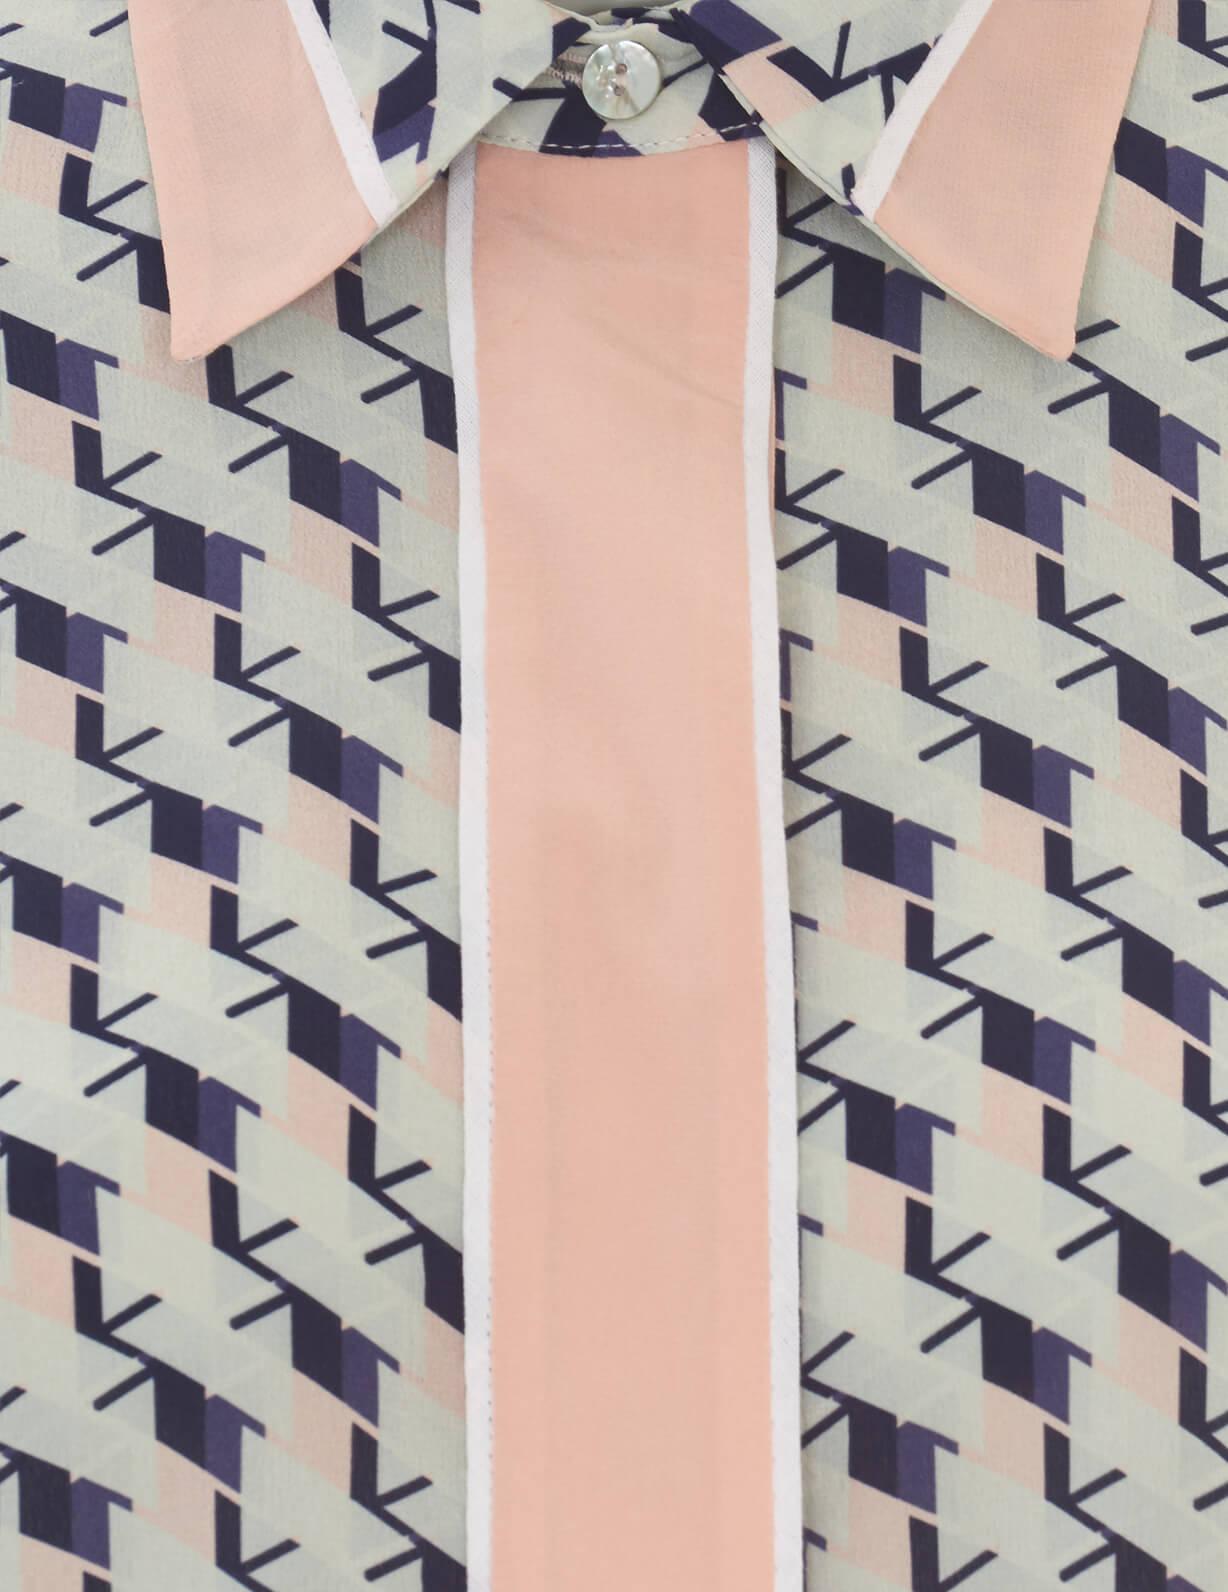 alter-era-ss18-jaha-002-printed-silk-placket-blouse-blades-detail.jpg